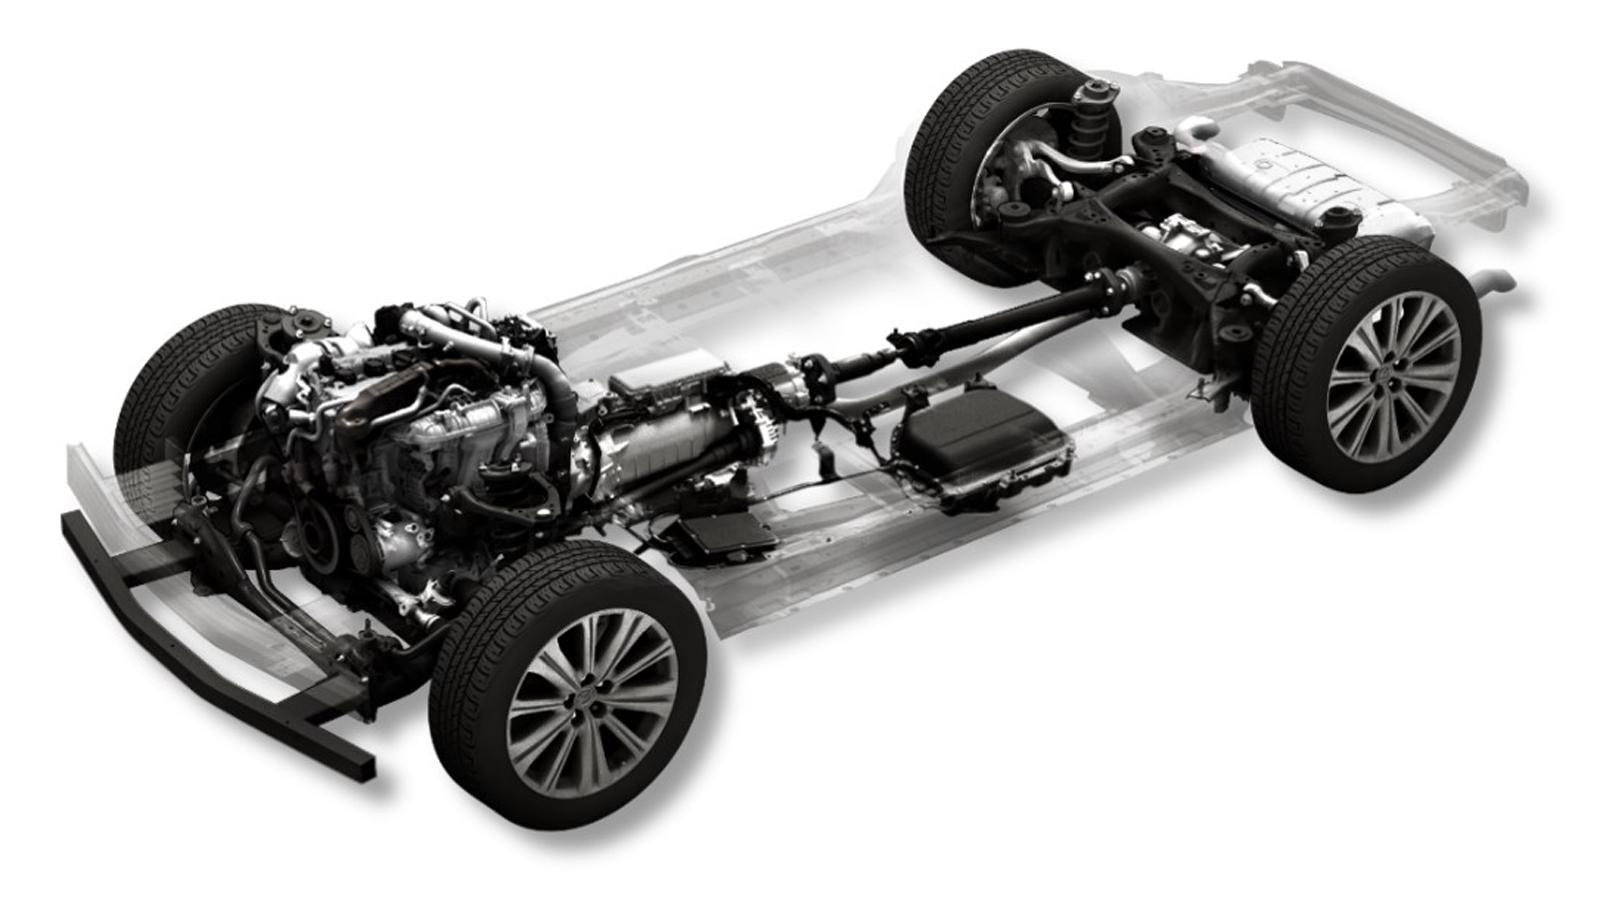 Mazda's Large Gasoline Engine 48V Mild hybrid